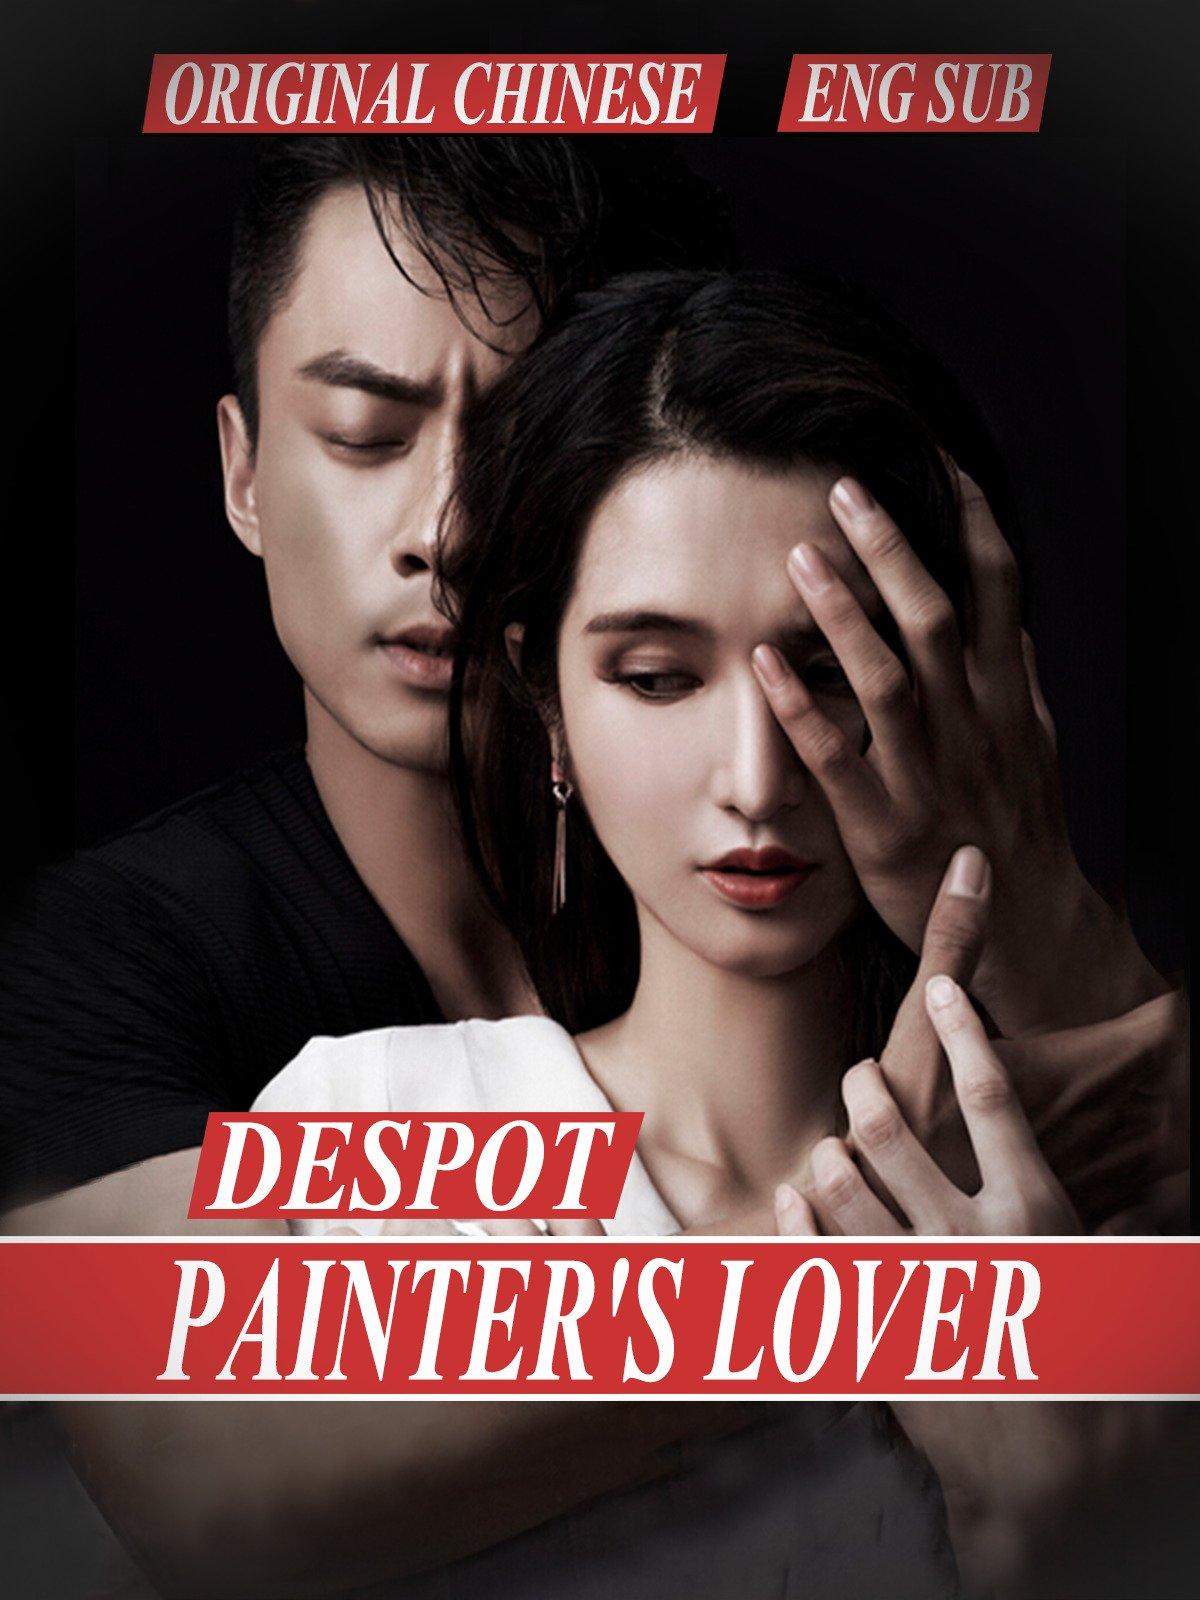 Despot painter's lover [Eng Sub] original Chinese on Amazon Prime Video UK